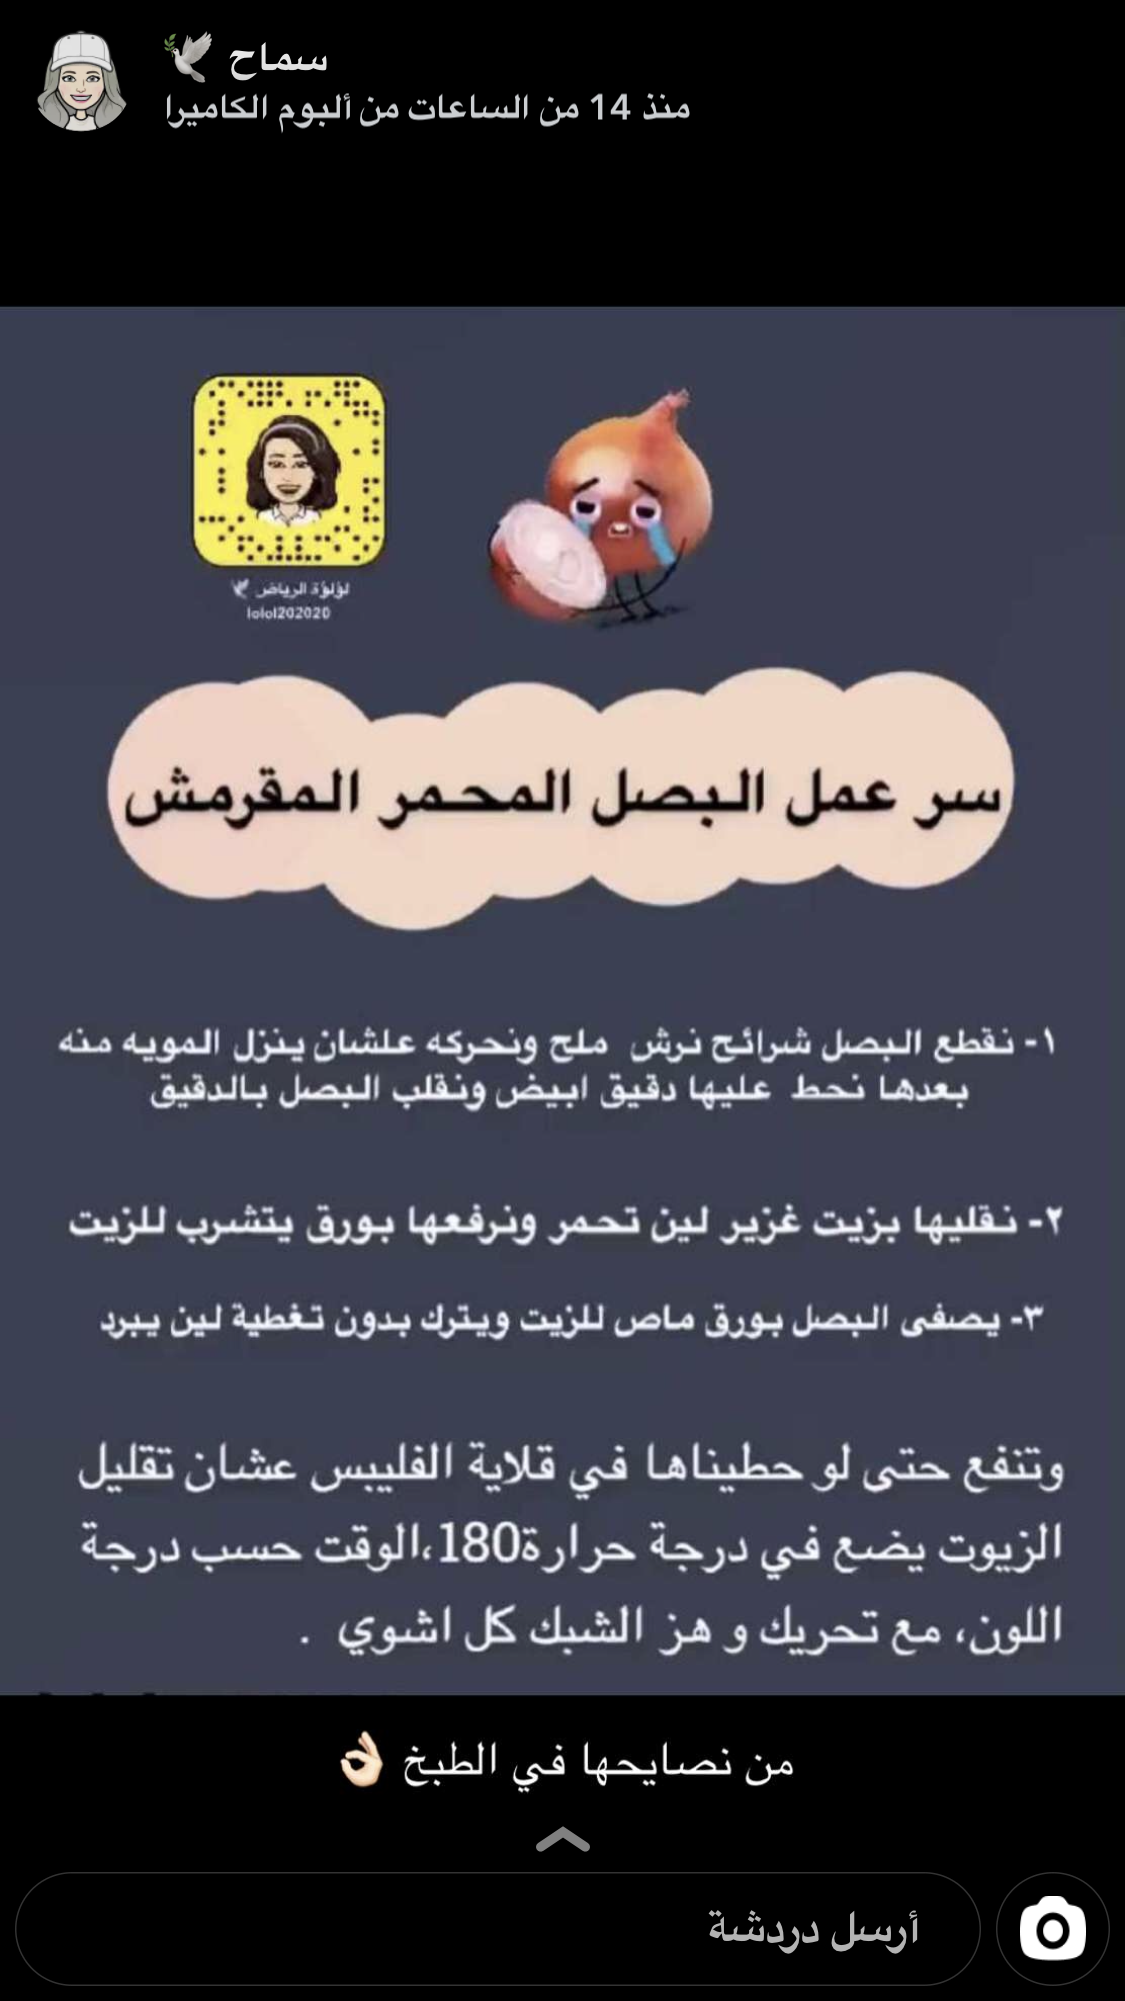 Pin By Sh On Food Tricks In 2020 Algerian Recipes Food Hacks Arabic Food